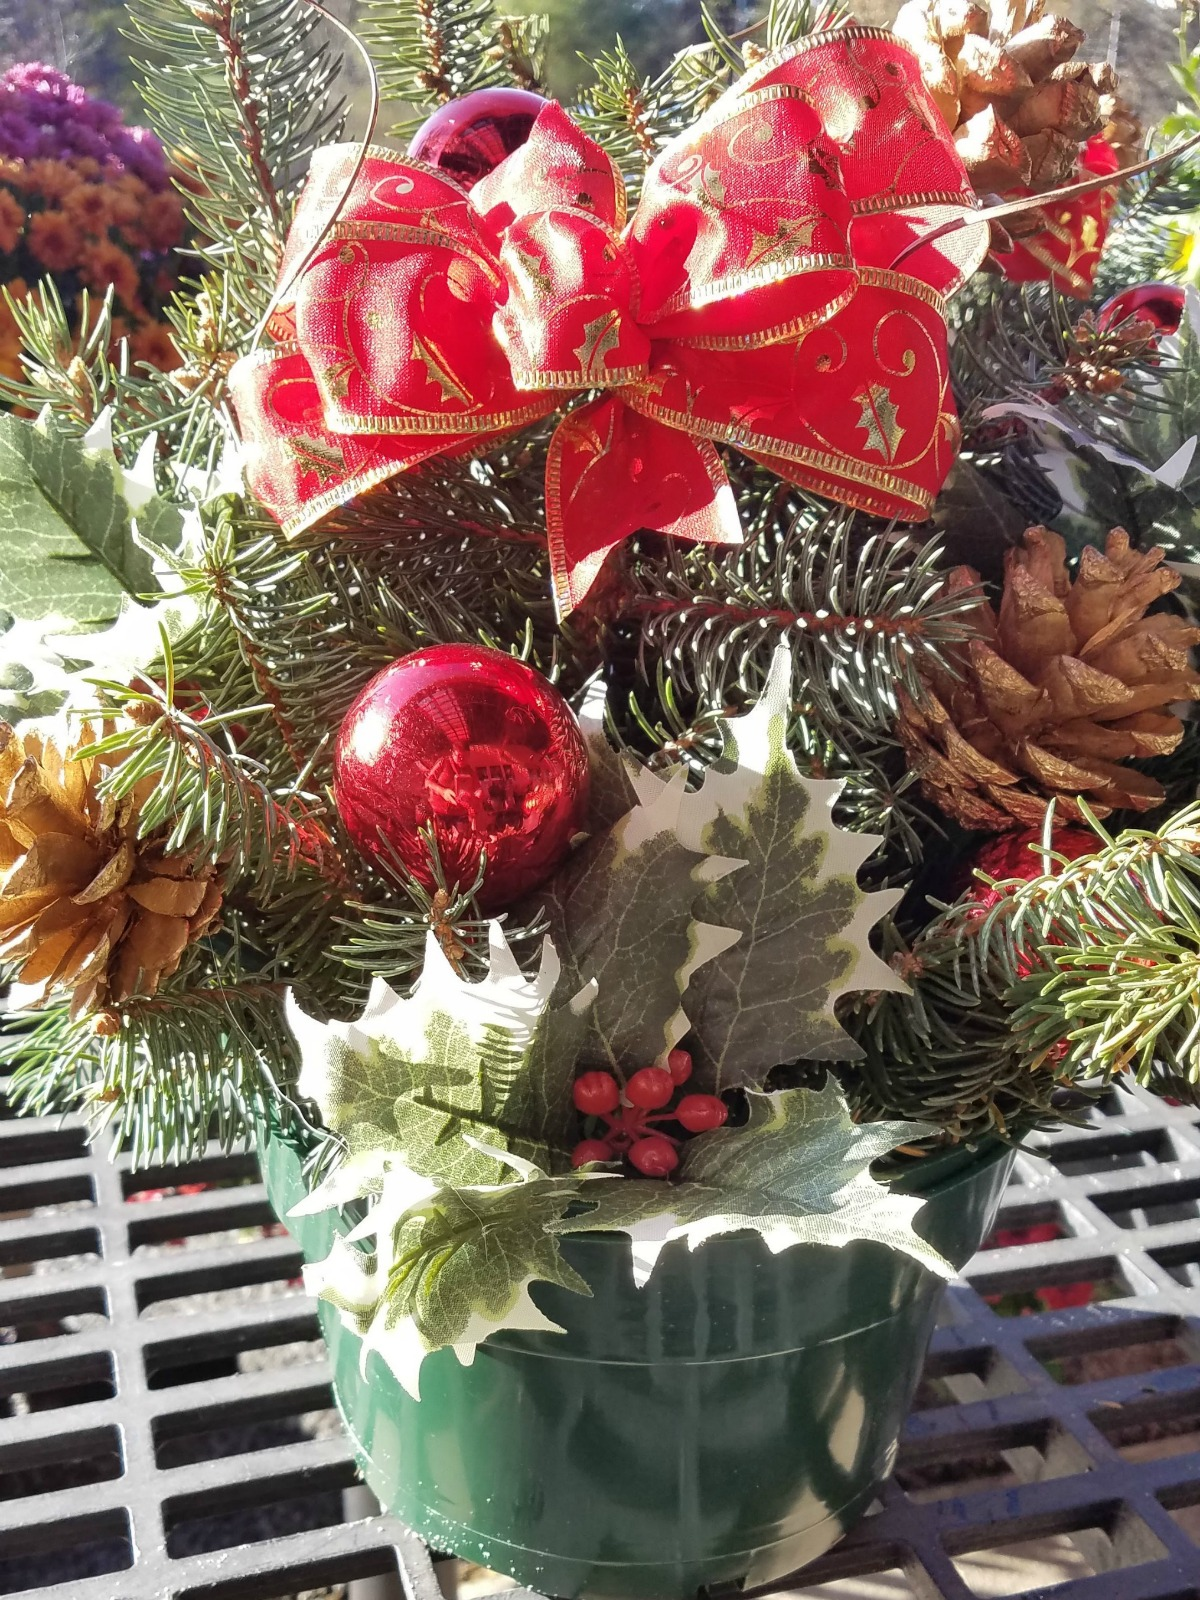 Herbeins Garden Center Christmas Cemetery Pots